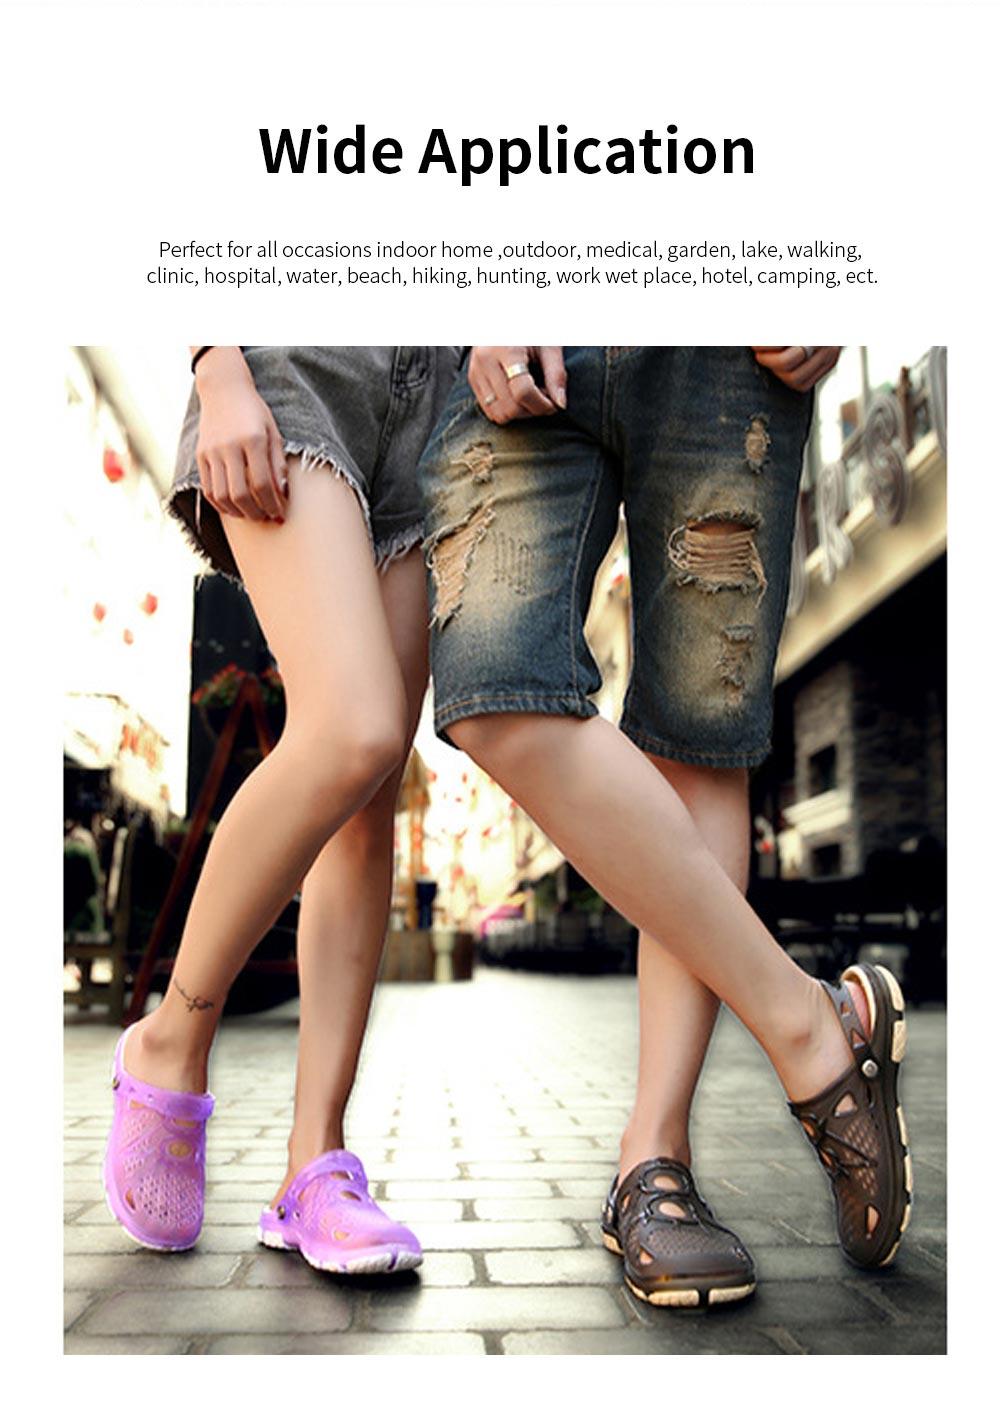 Clog Shoe Comfort Anti-slip Casual Water Shoe Beach Footwear Summer Slippers Sandal for Men Women 5